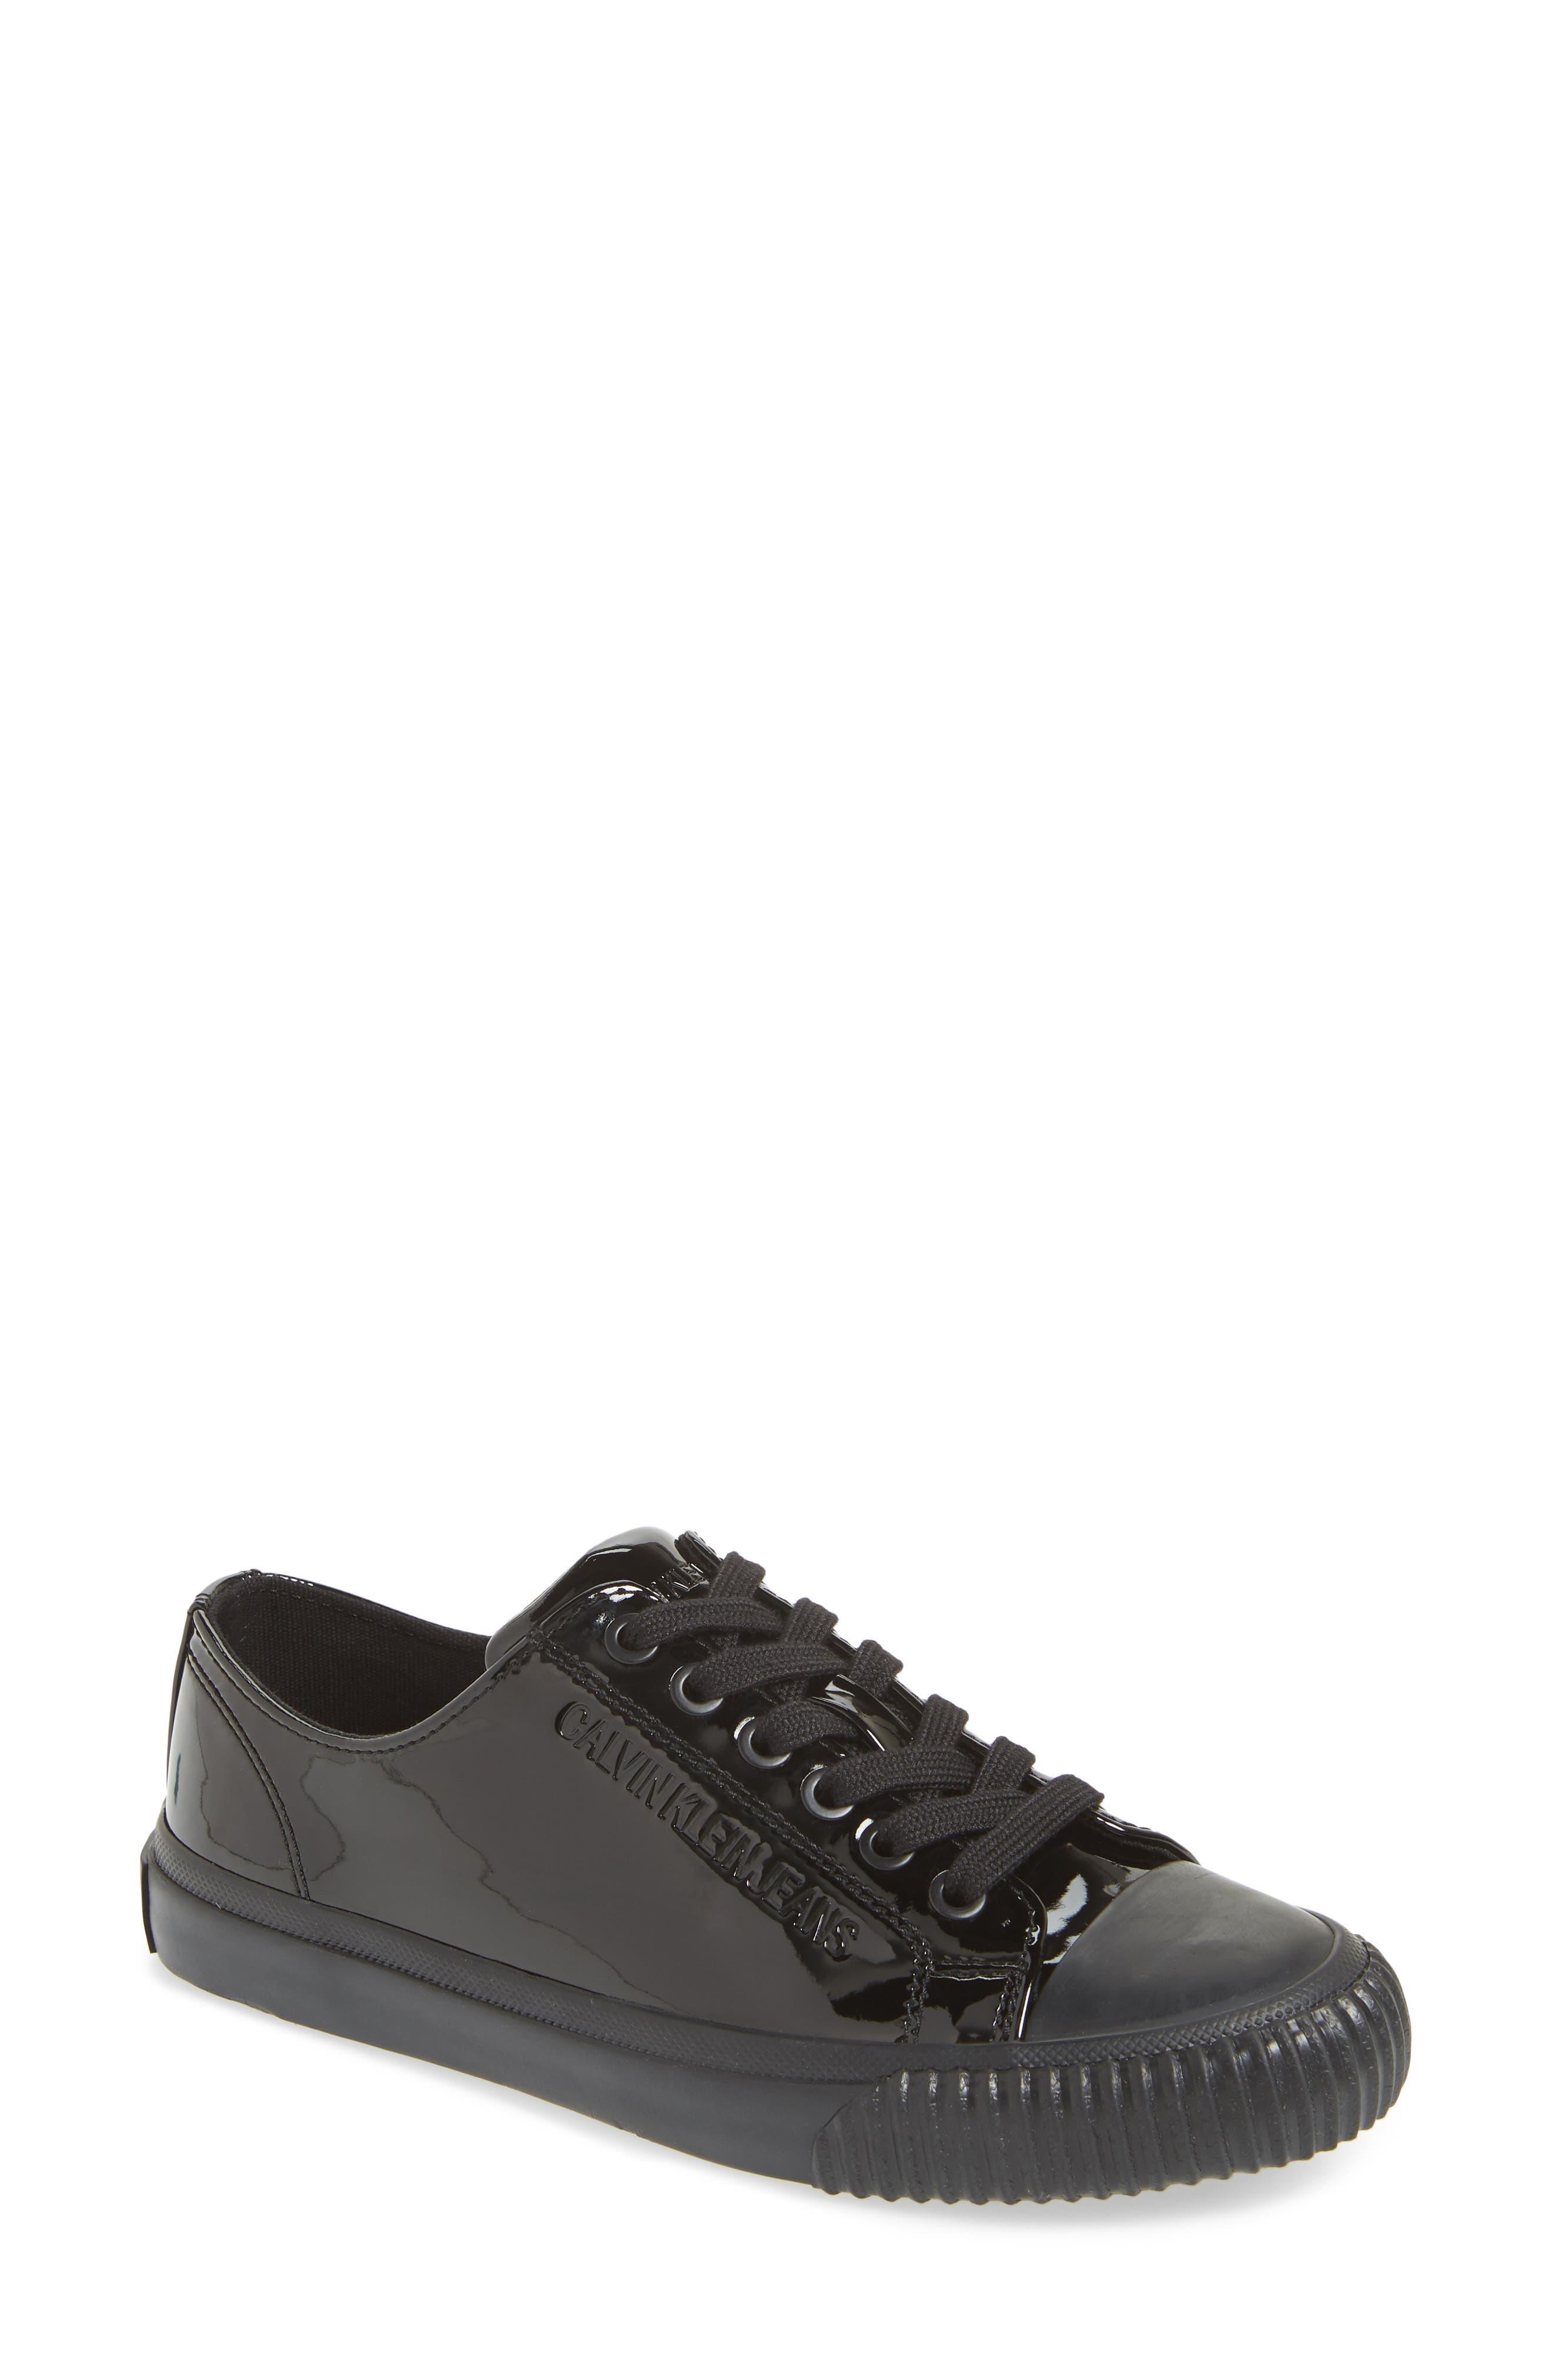 Ireland Lace-Up Sneaker, Black